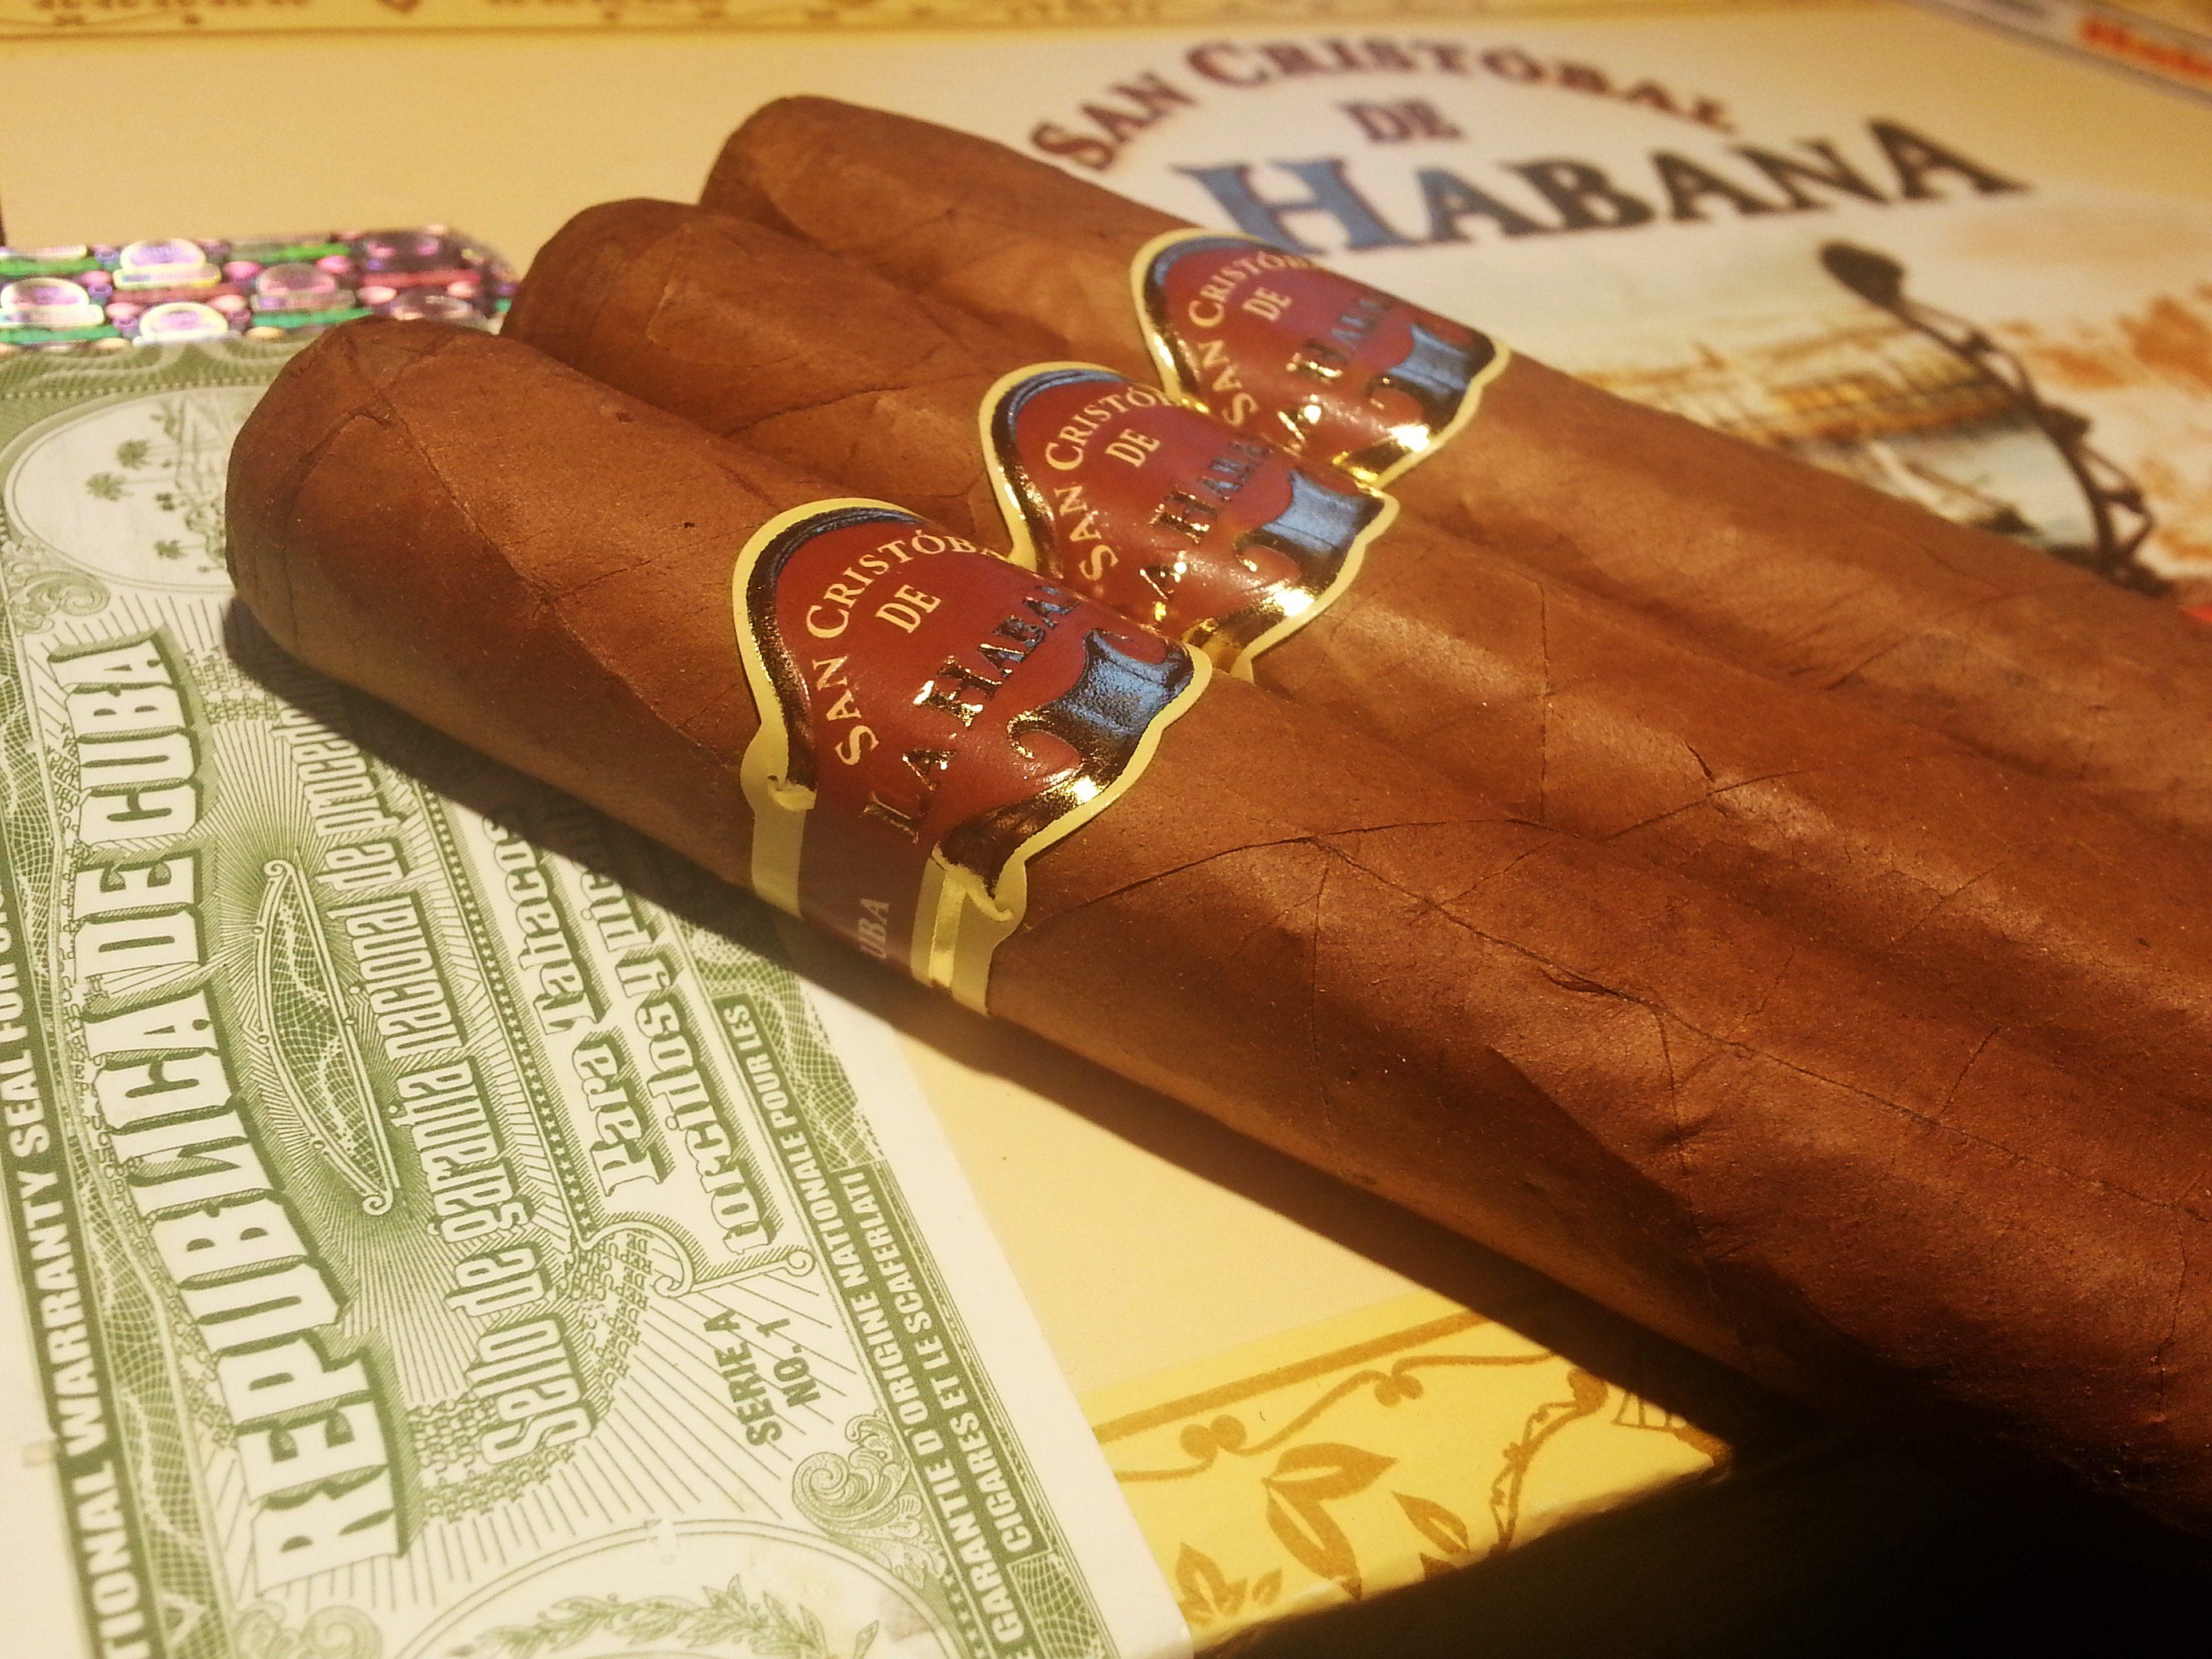 Blind Cigar Review: San Cristobal de la Habana (Cuba) | El Principe